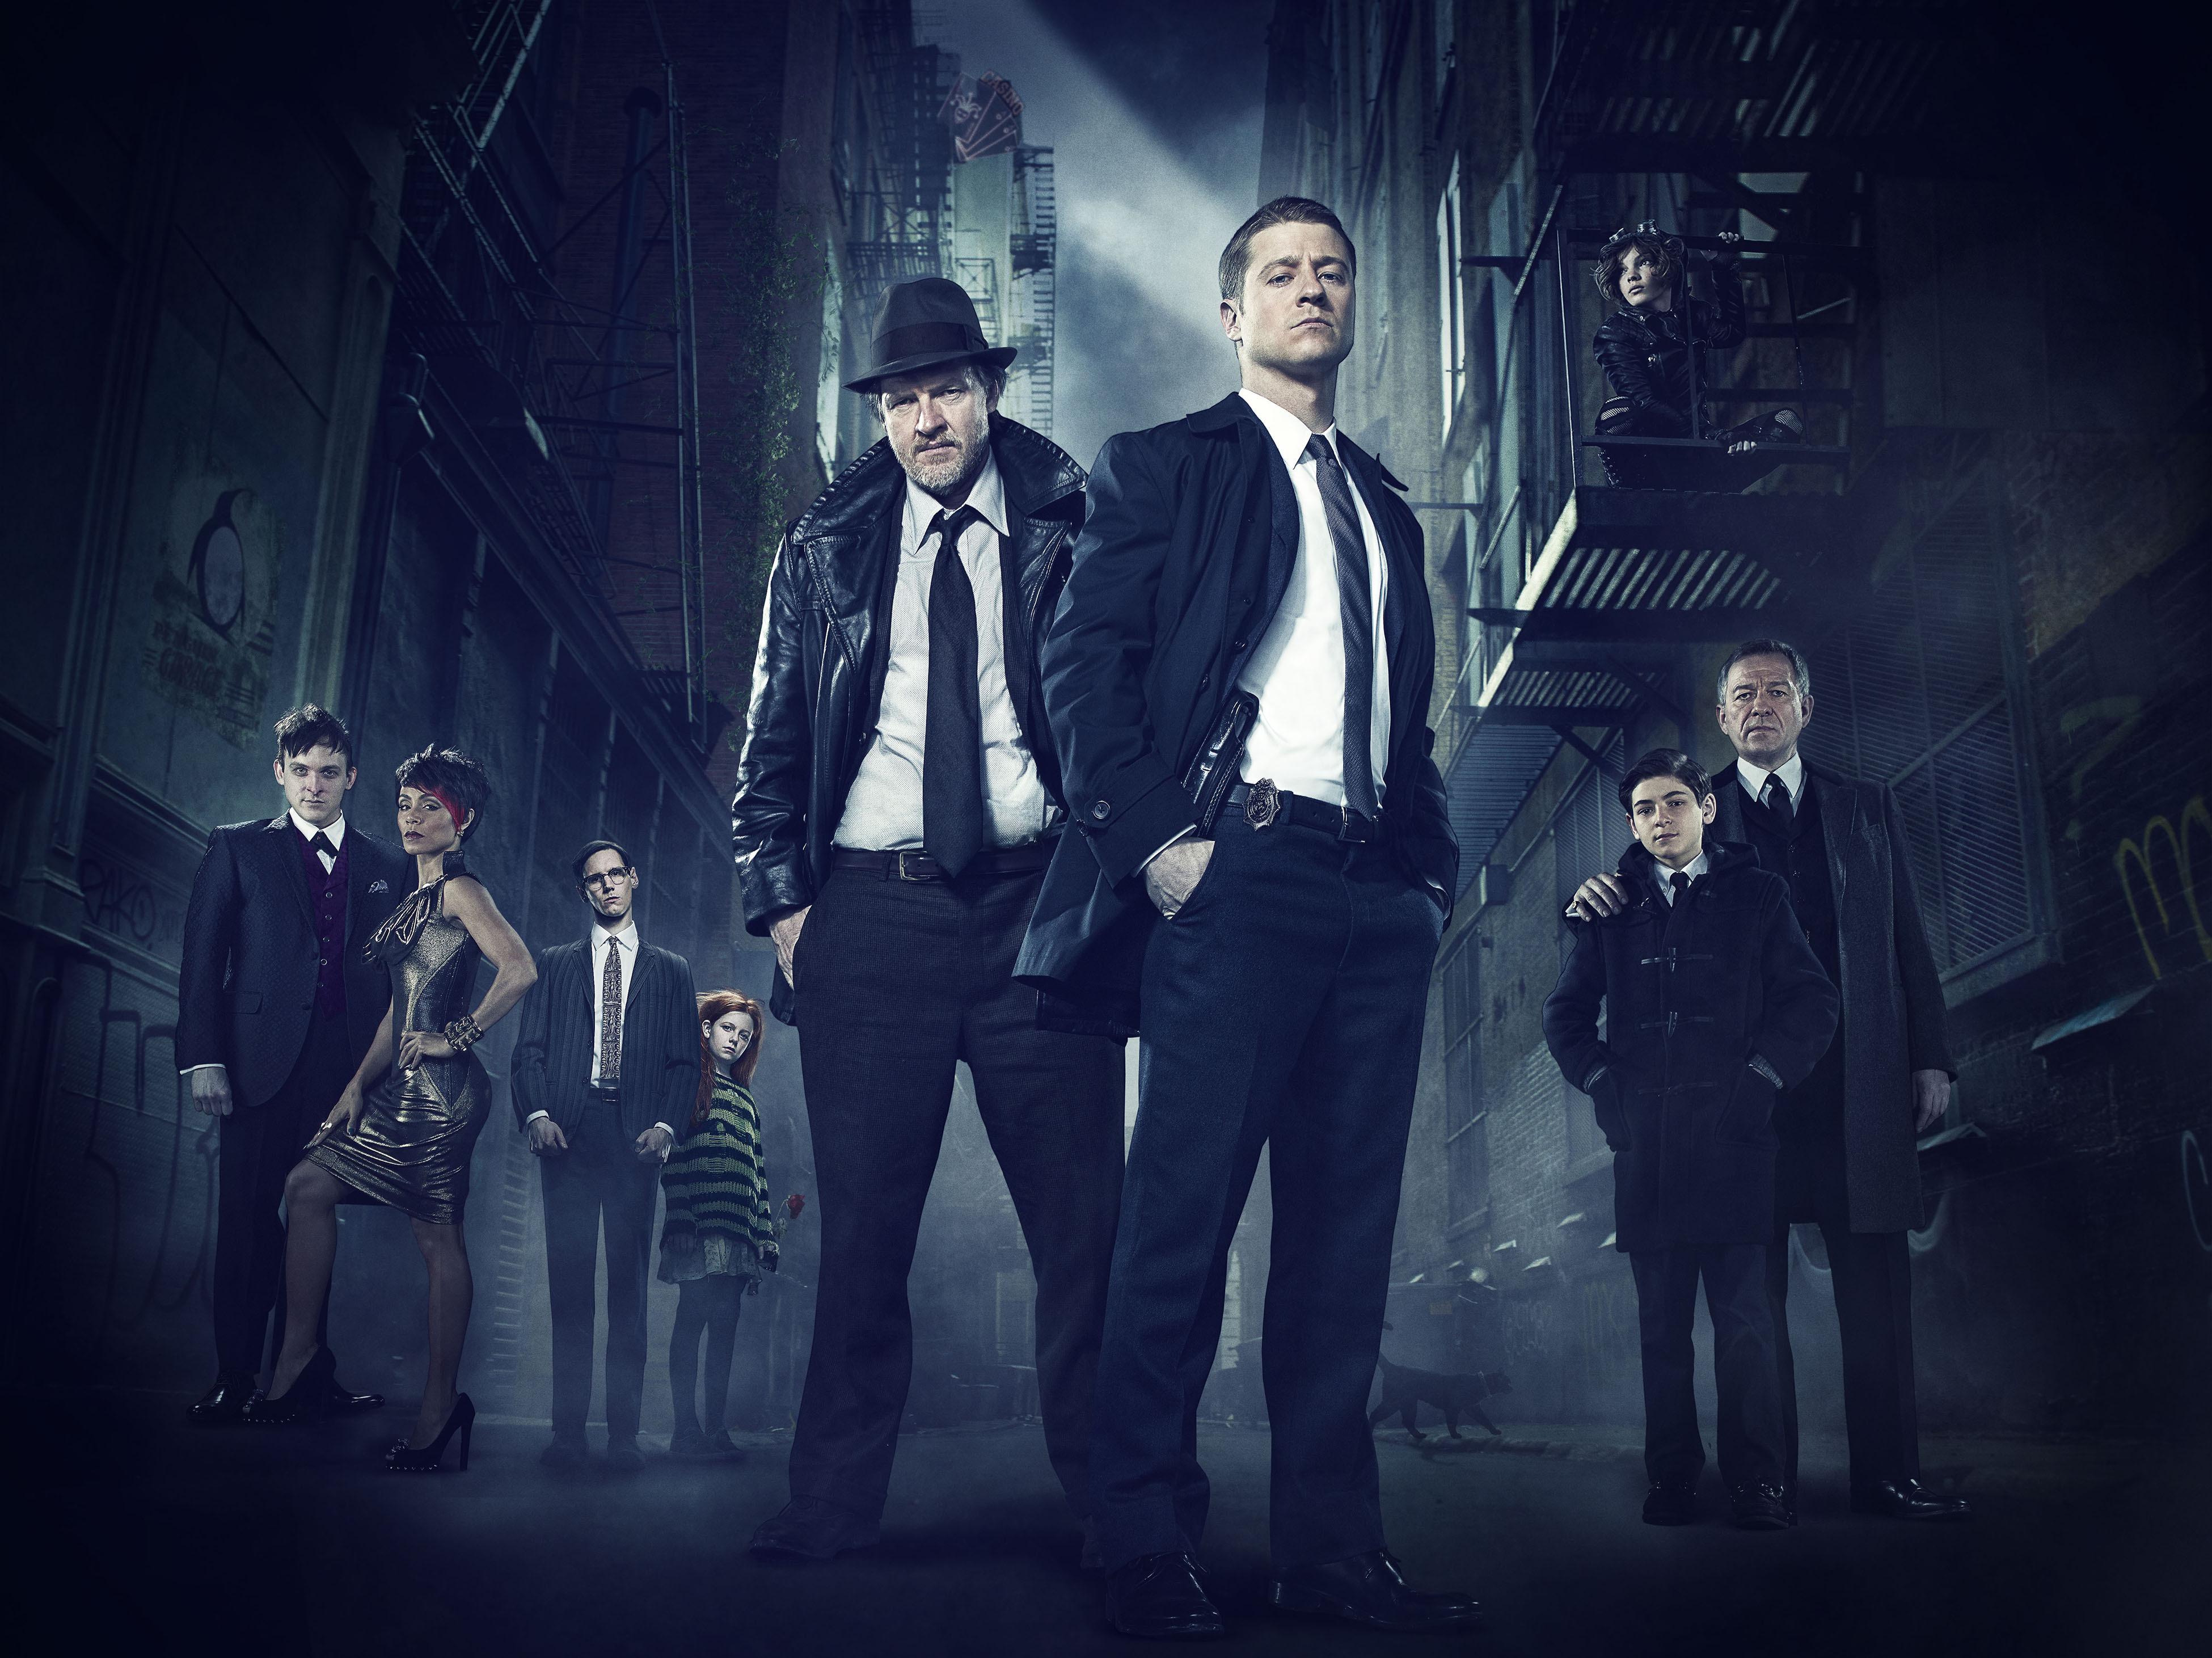 Gotham wallpaper 3